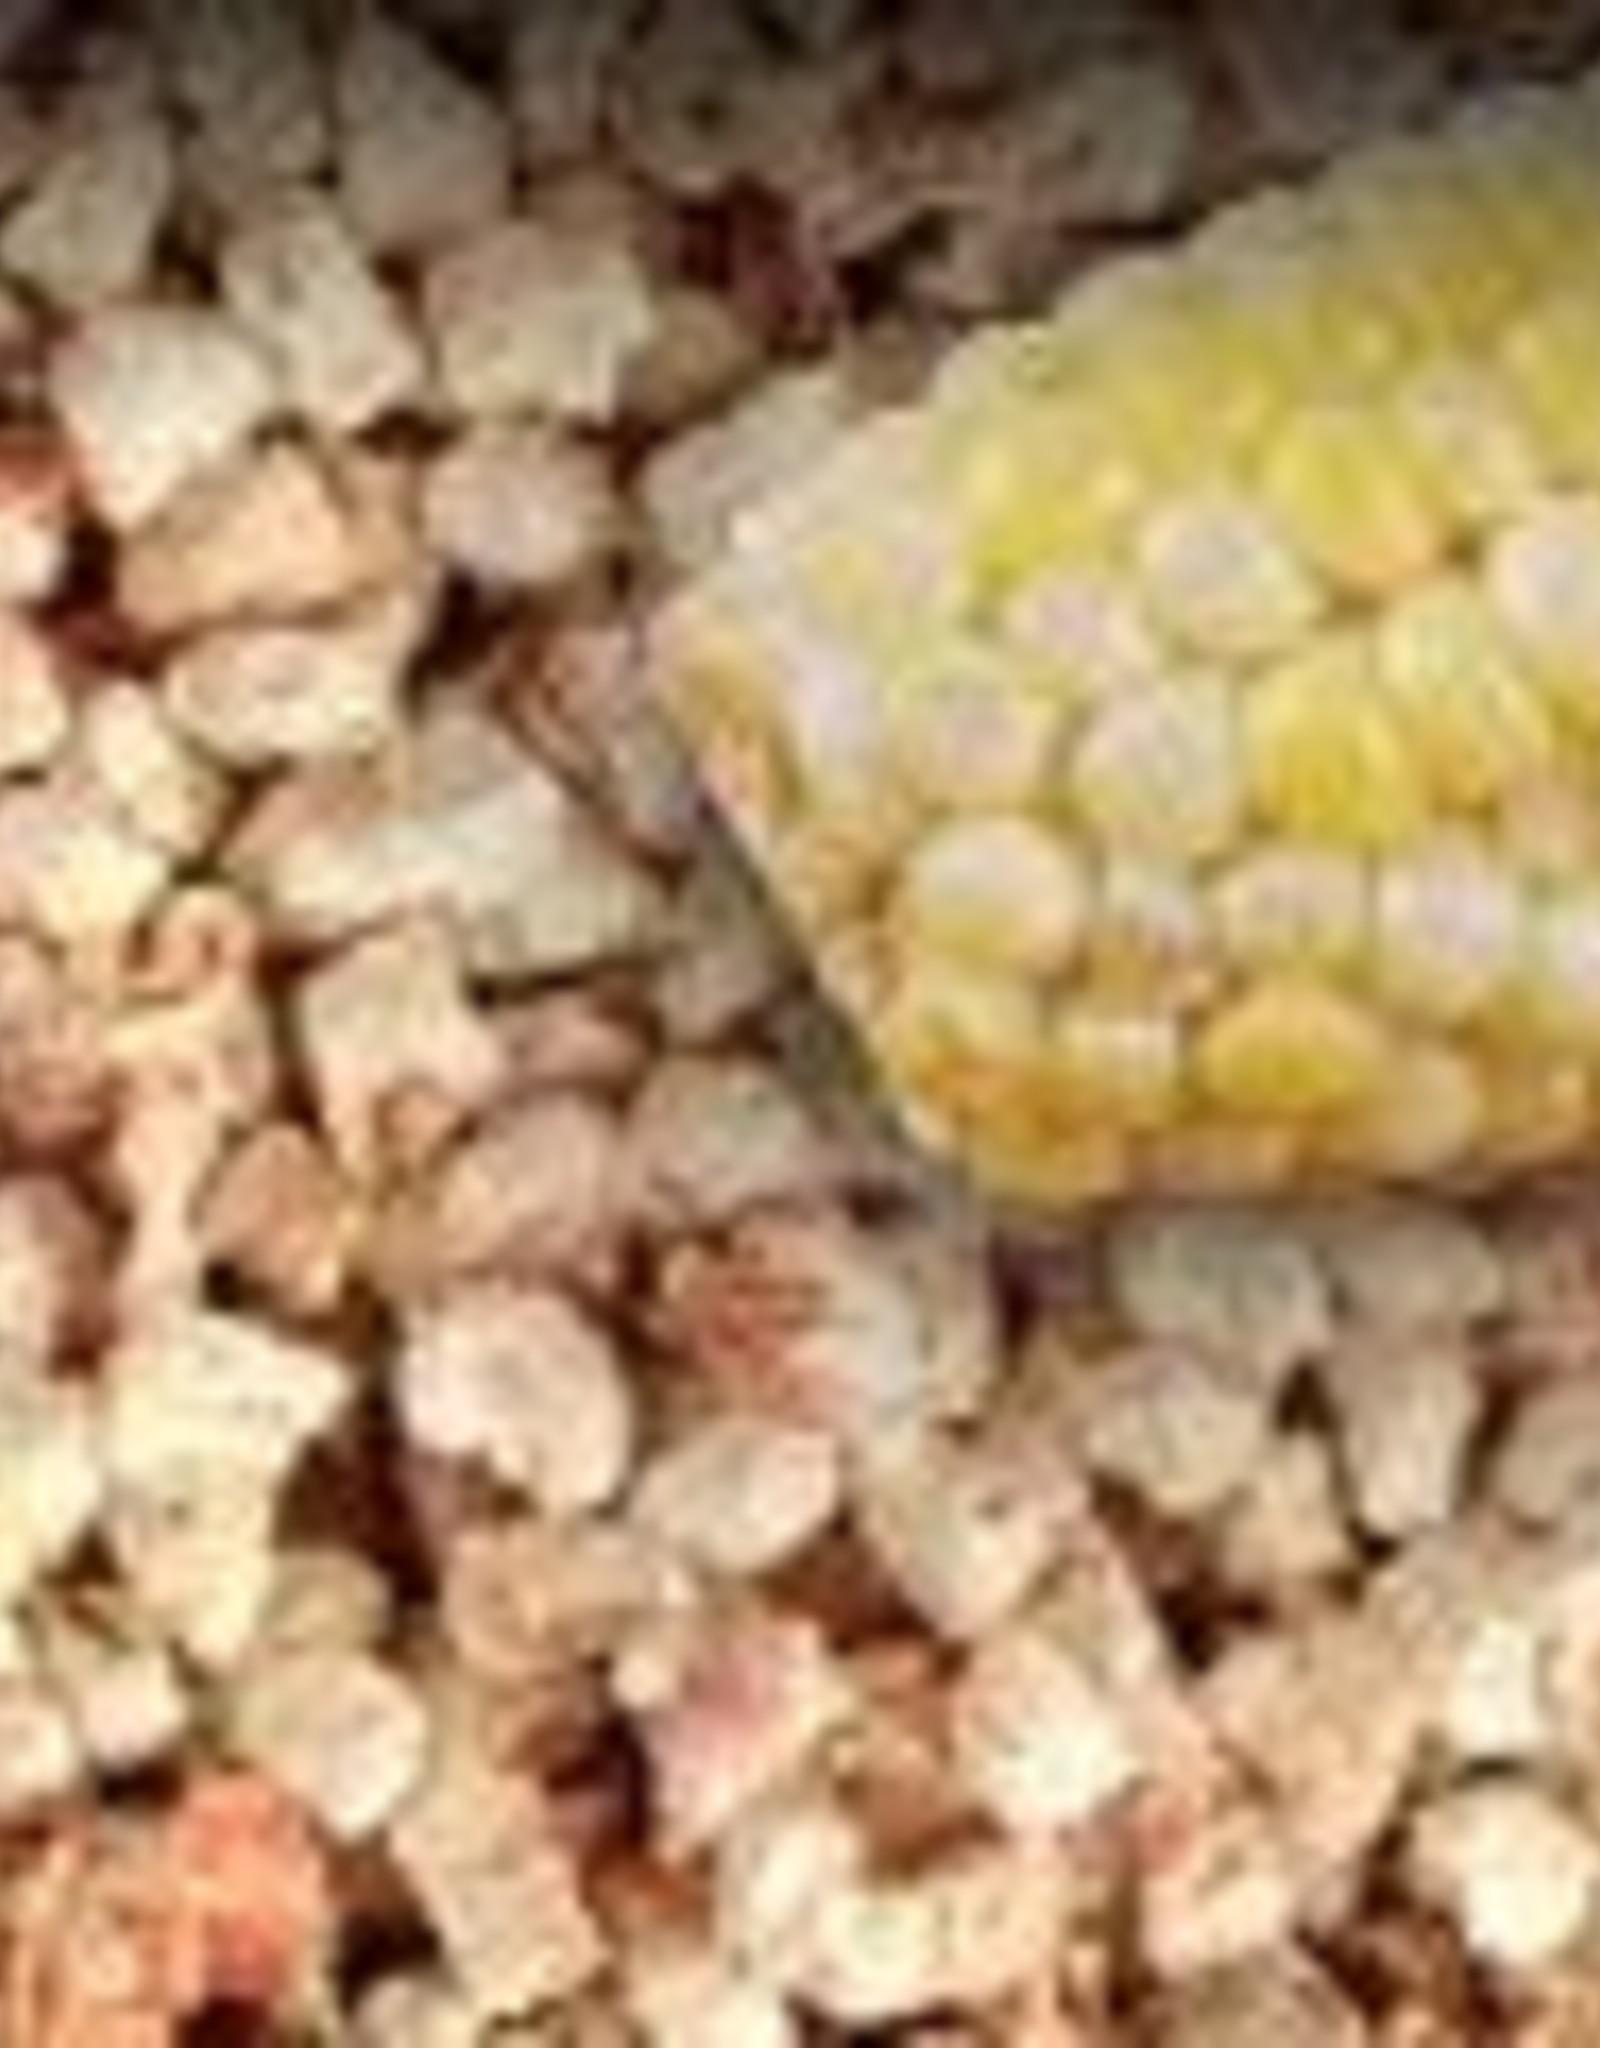 Pestell Corn Cob Bedding 40lb